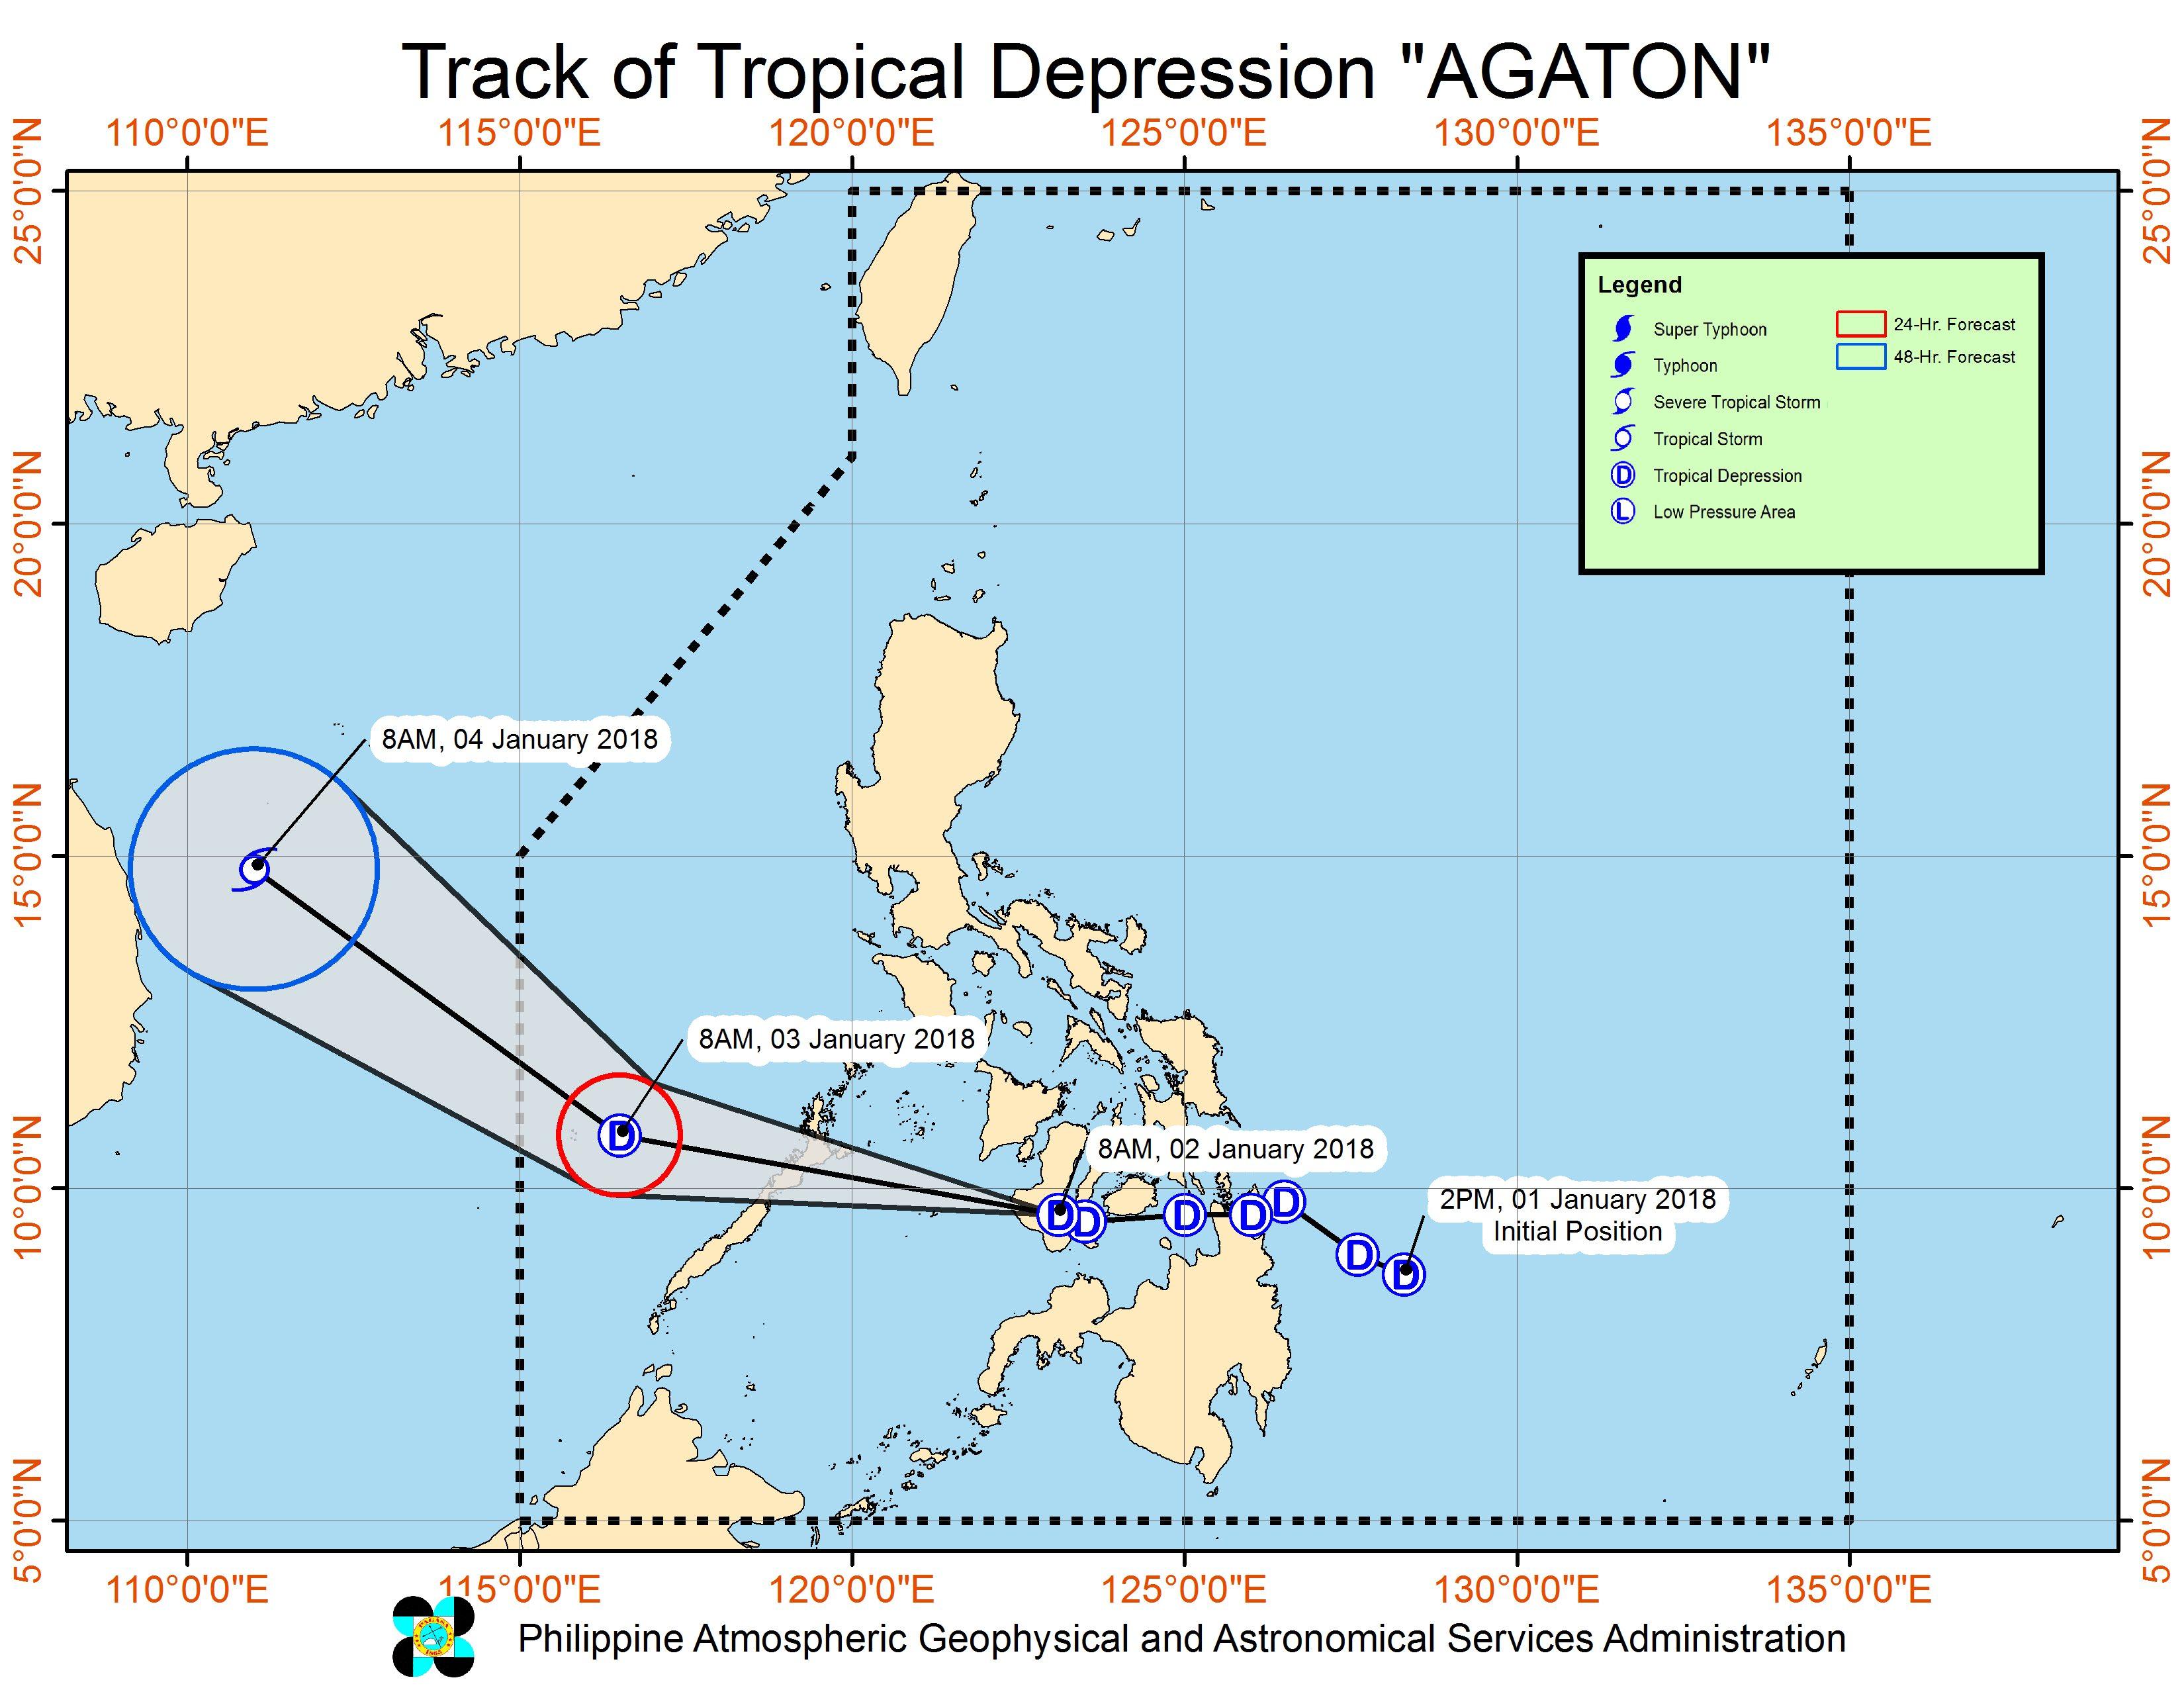 Forecast track of Tropical Depression Agaton as of January 2, 11 am. Image courtesy of PAGASA